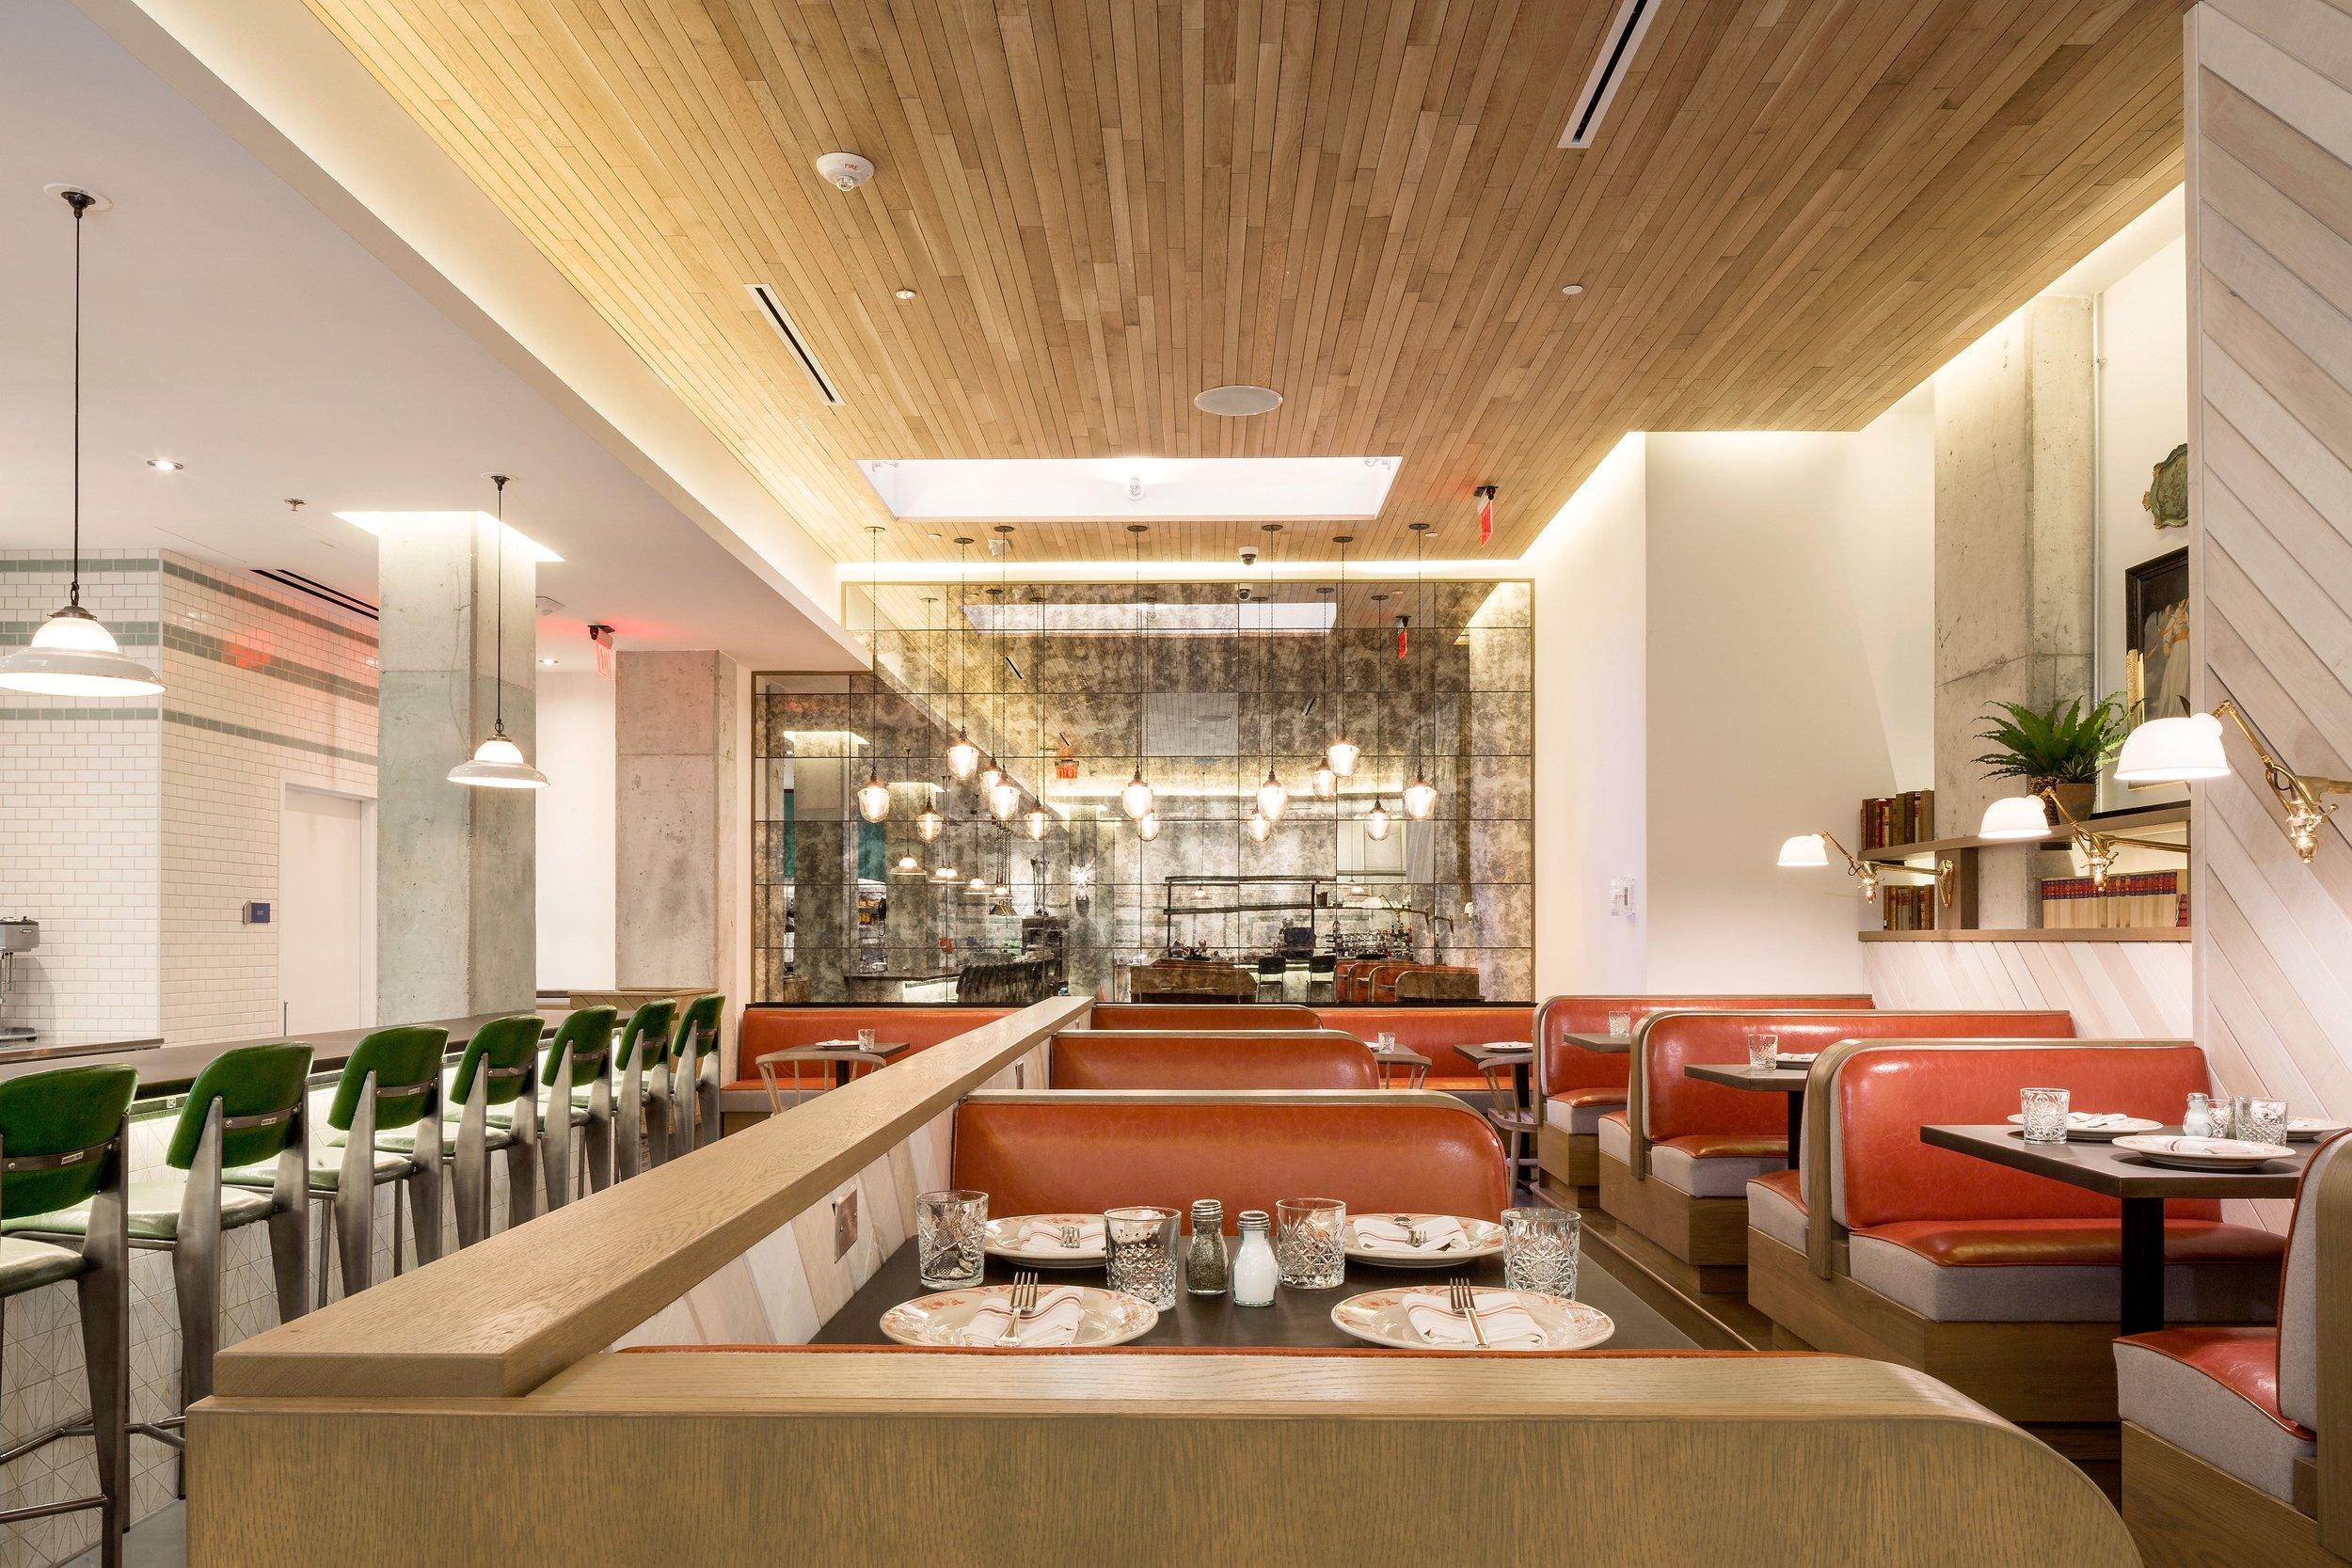 studio-saint-hotels-pod-hotel-crimson-diner-washington-dc-4